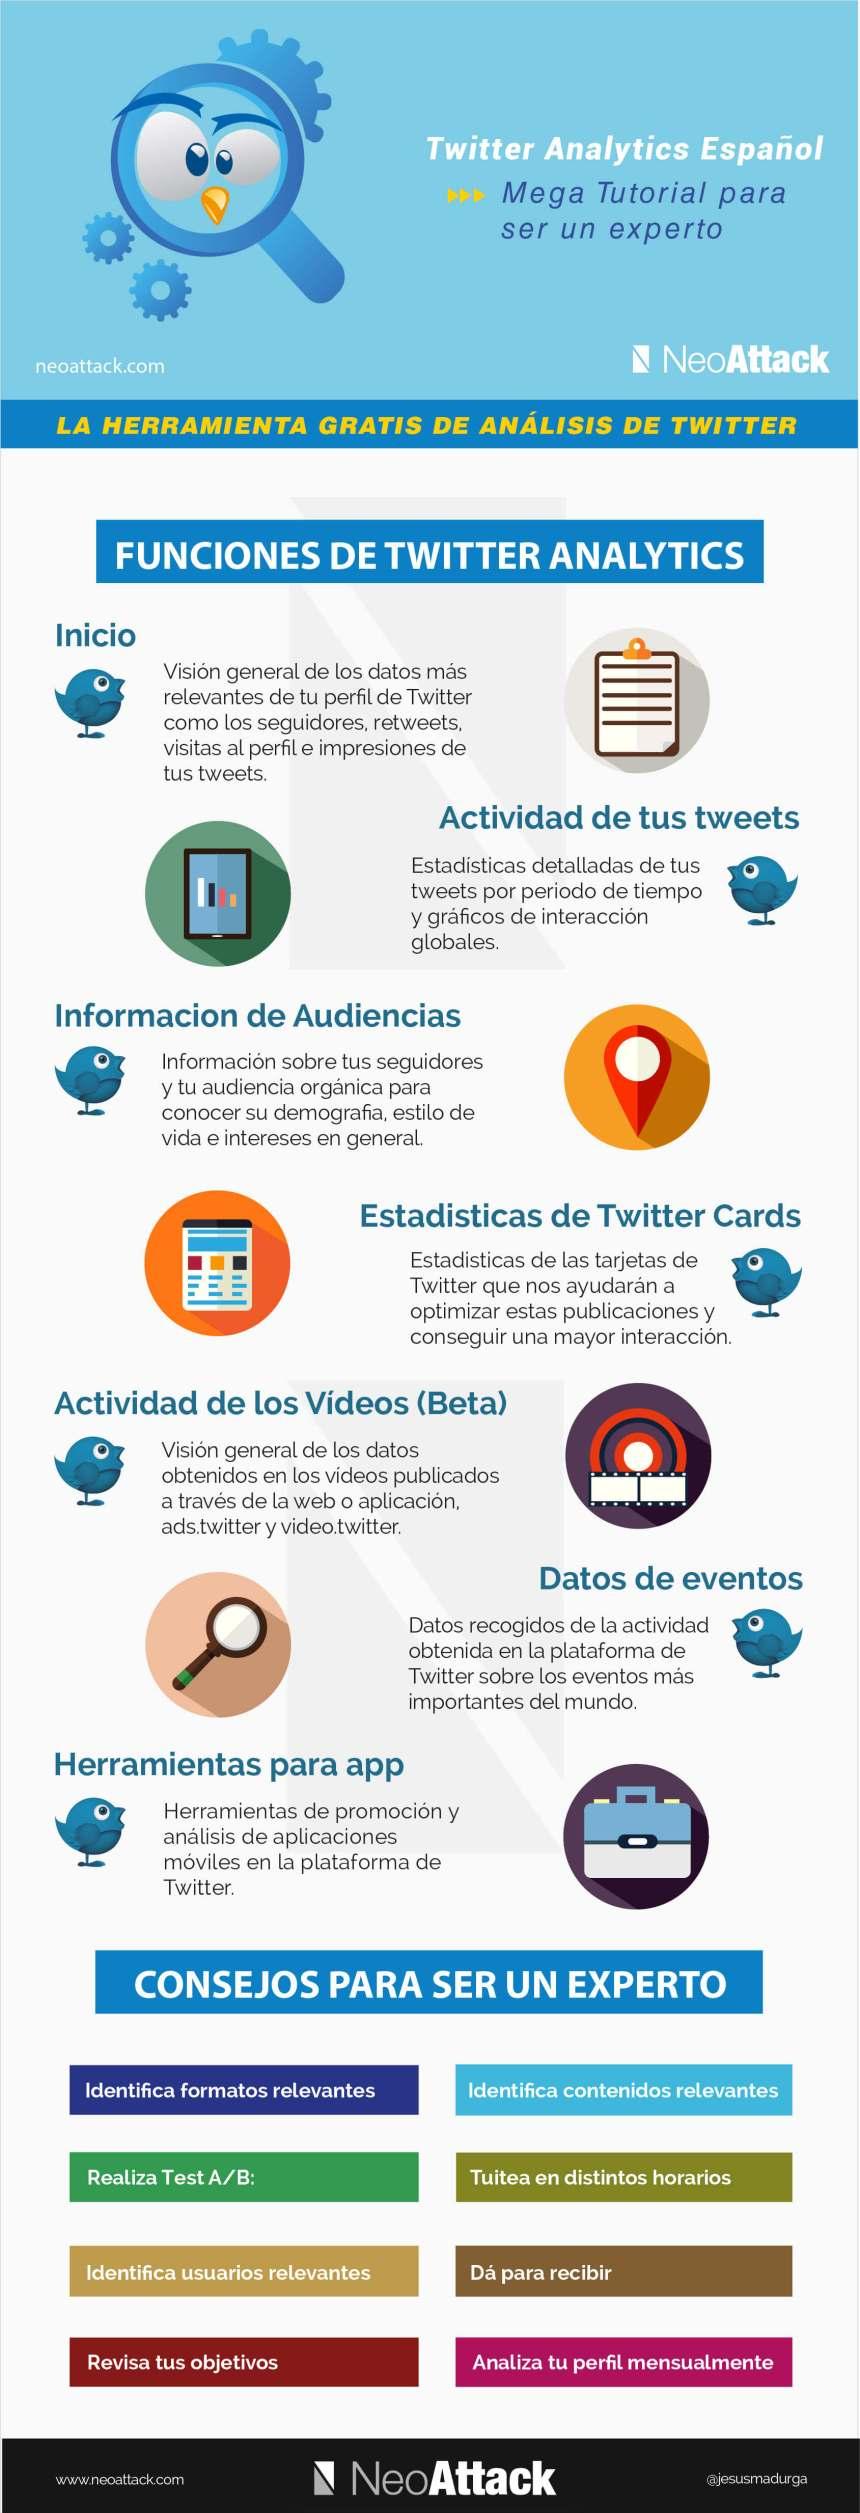 Twitter Analytics: todo lo que debes saber